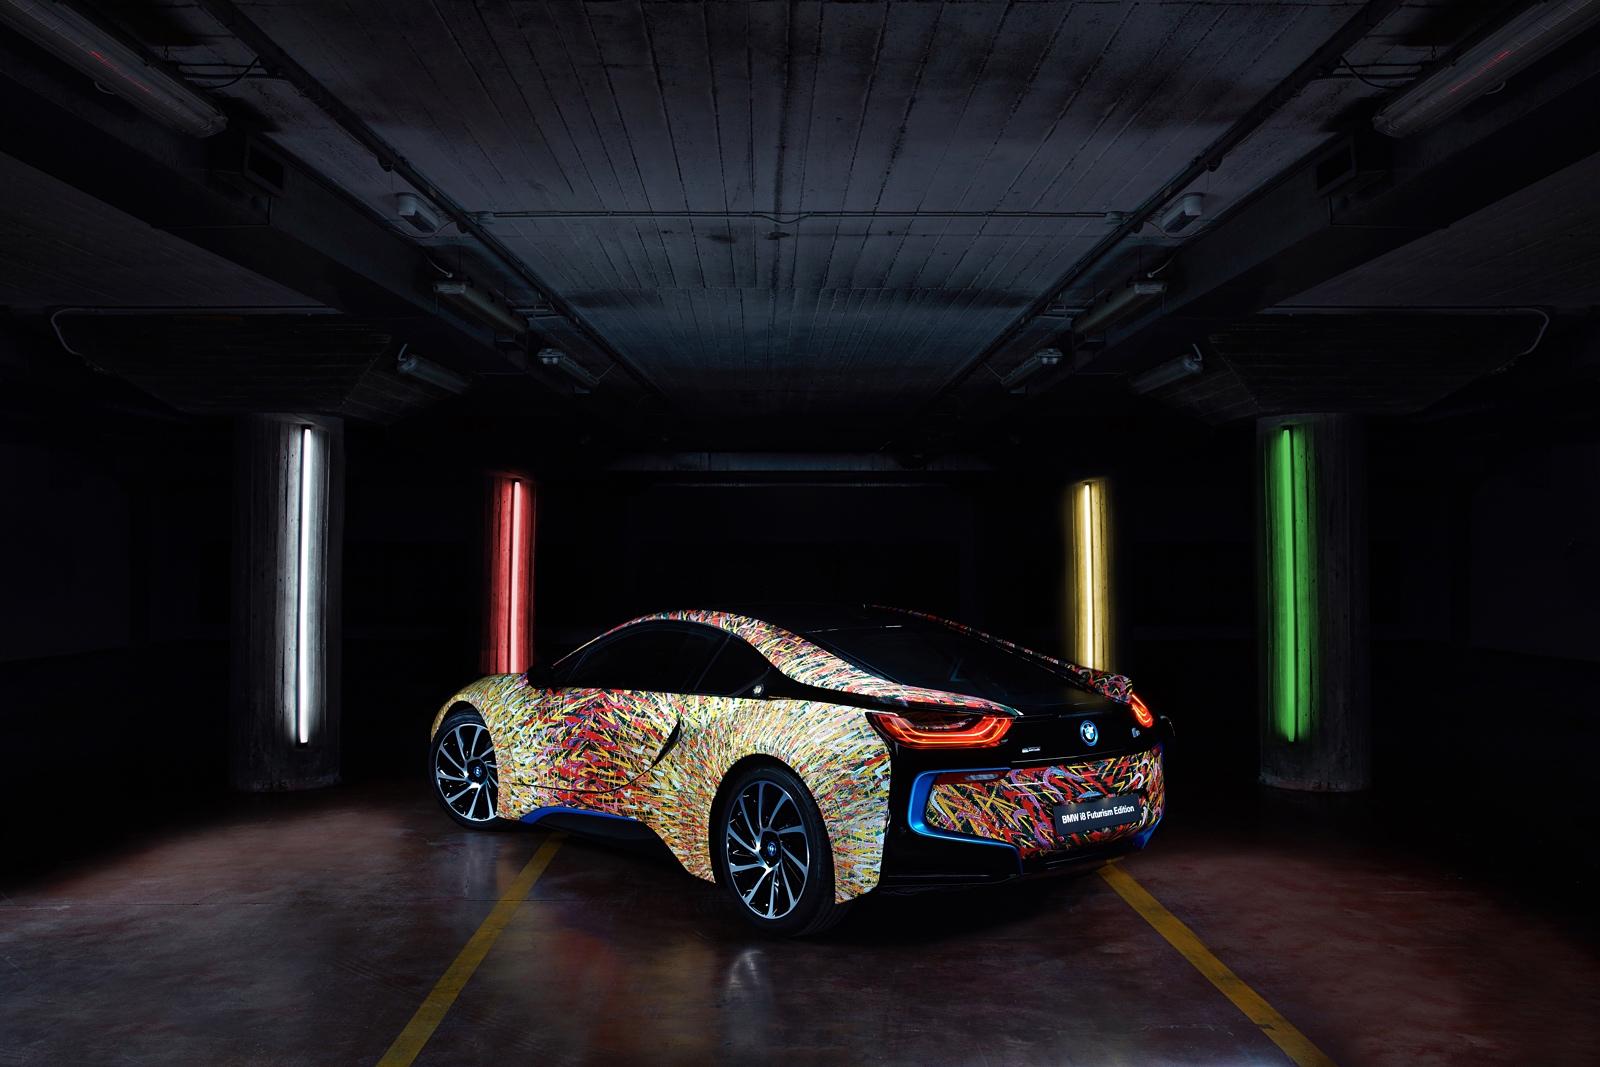 BMW Italia Presents the BMW i8 Futurism Edition - BimmerFile